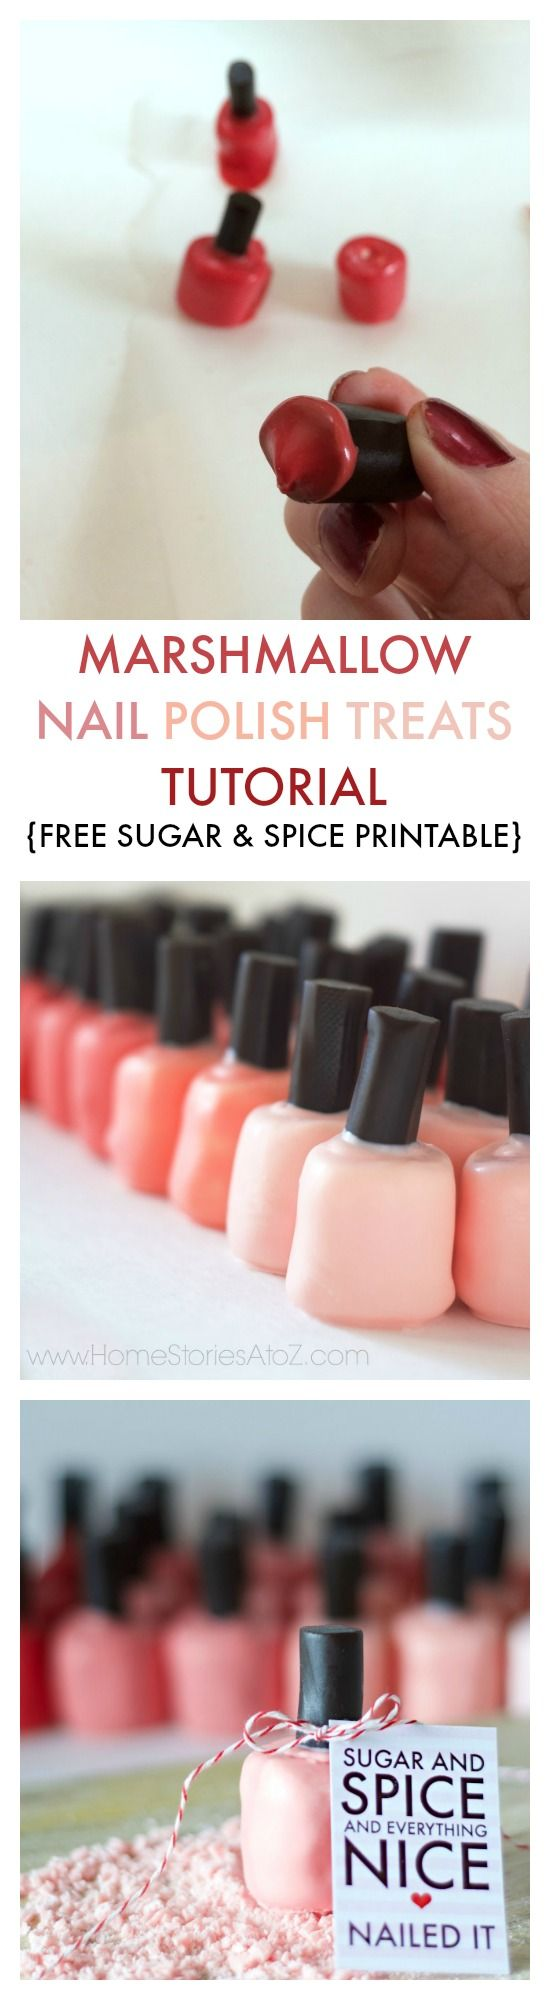 So cute! Marshmallow nail polish treats with FREE printable.